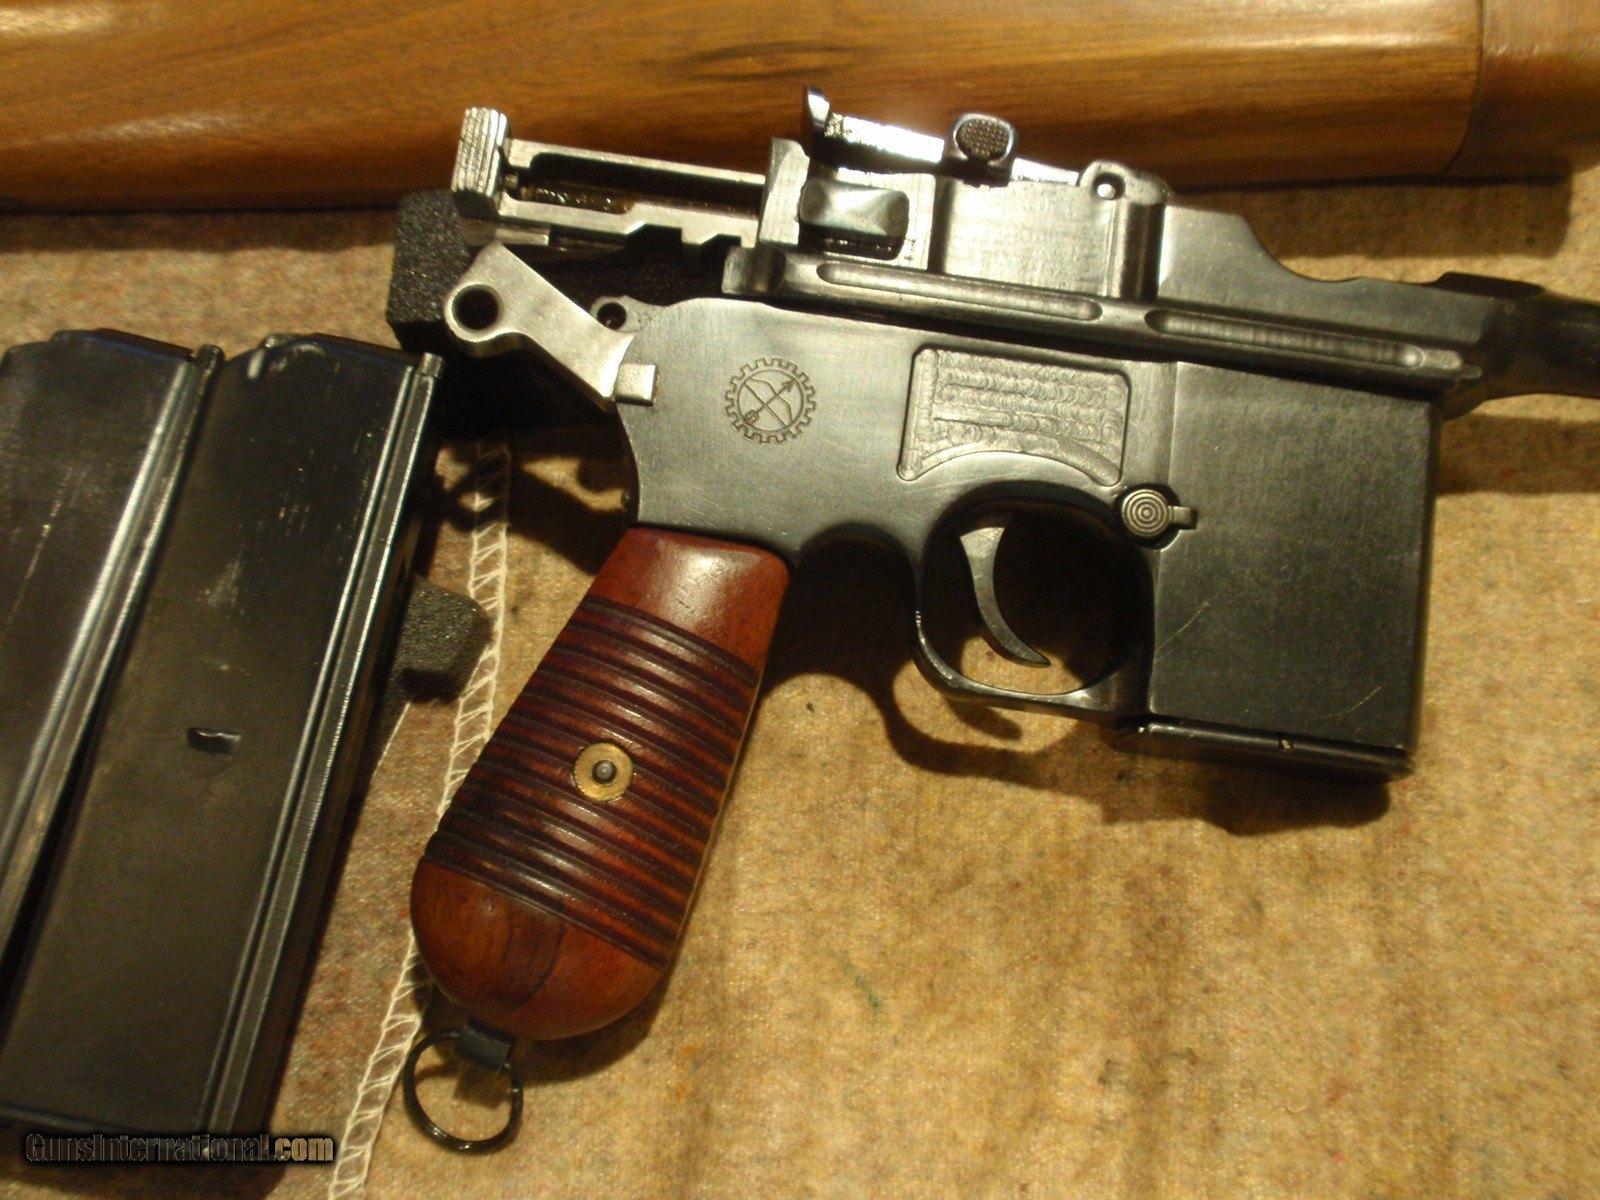 c96 broomhandle model 1930 detachable magazine 9mm chinese arsenal